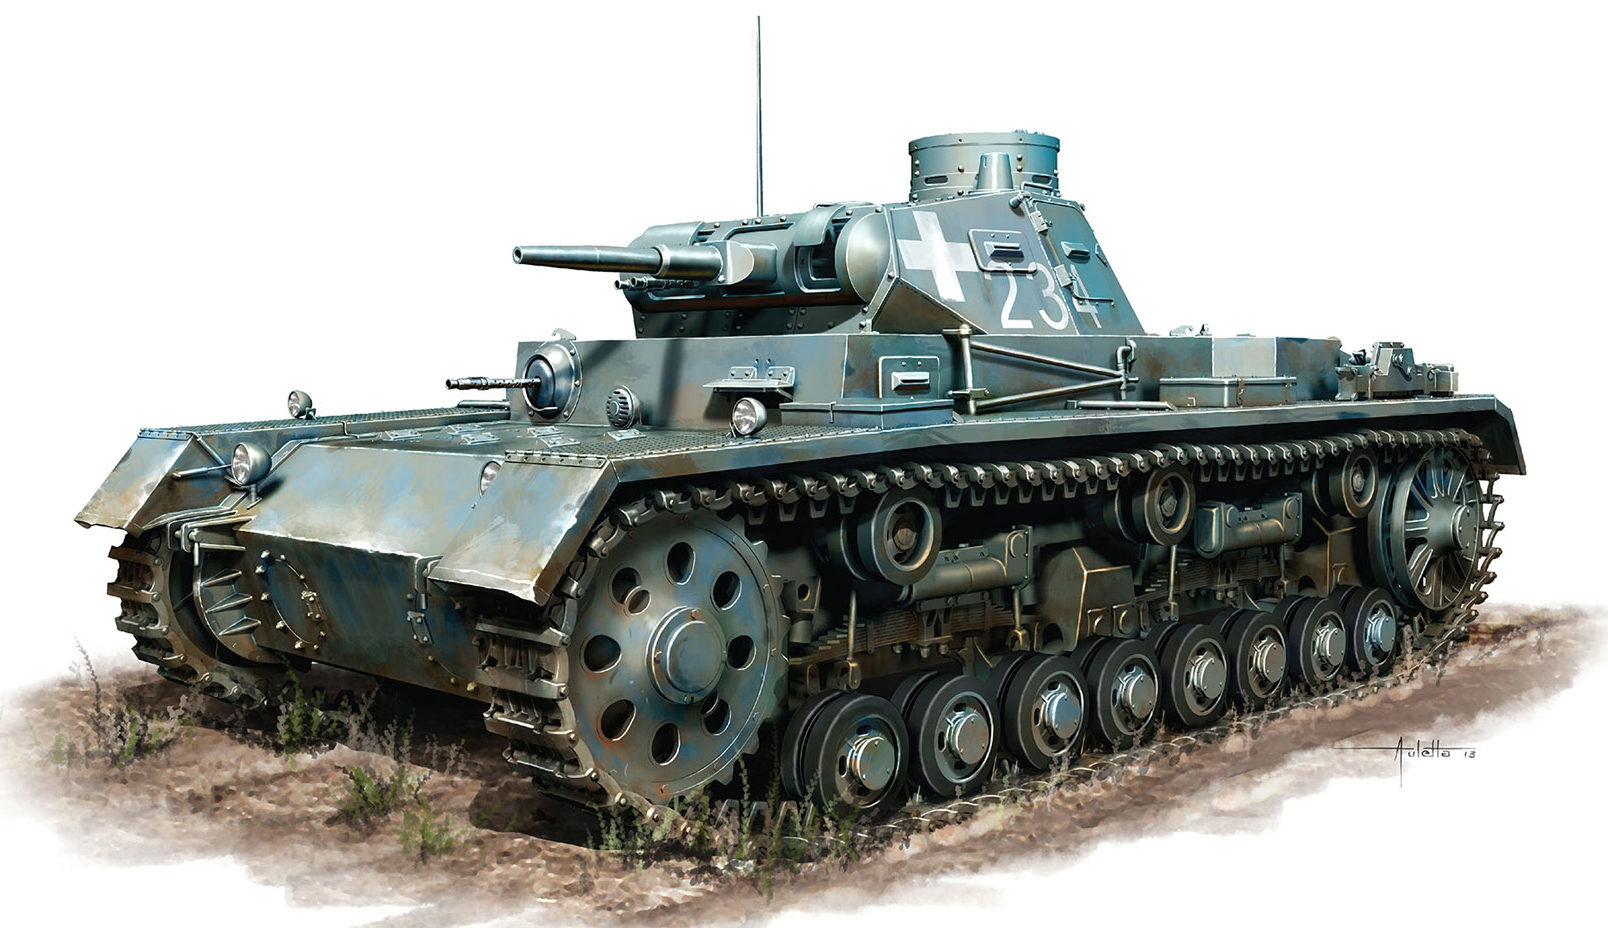 Auletta Vincenzo. Танк Pz.Kpfw. III Ausf. B.